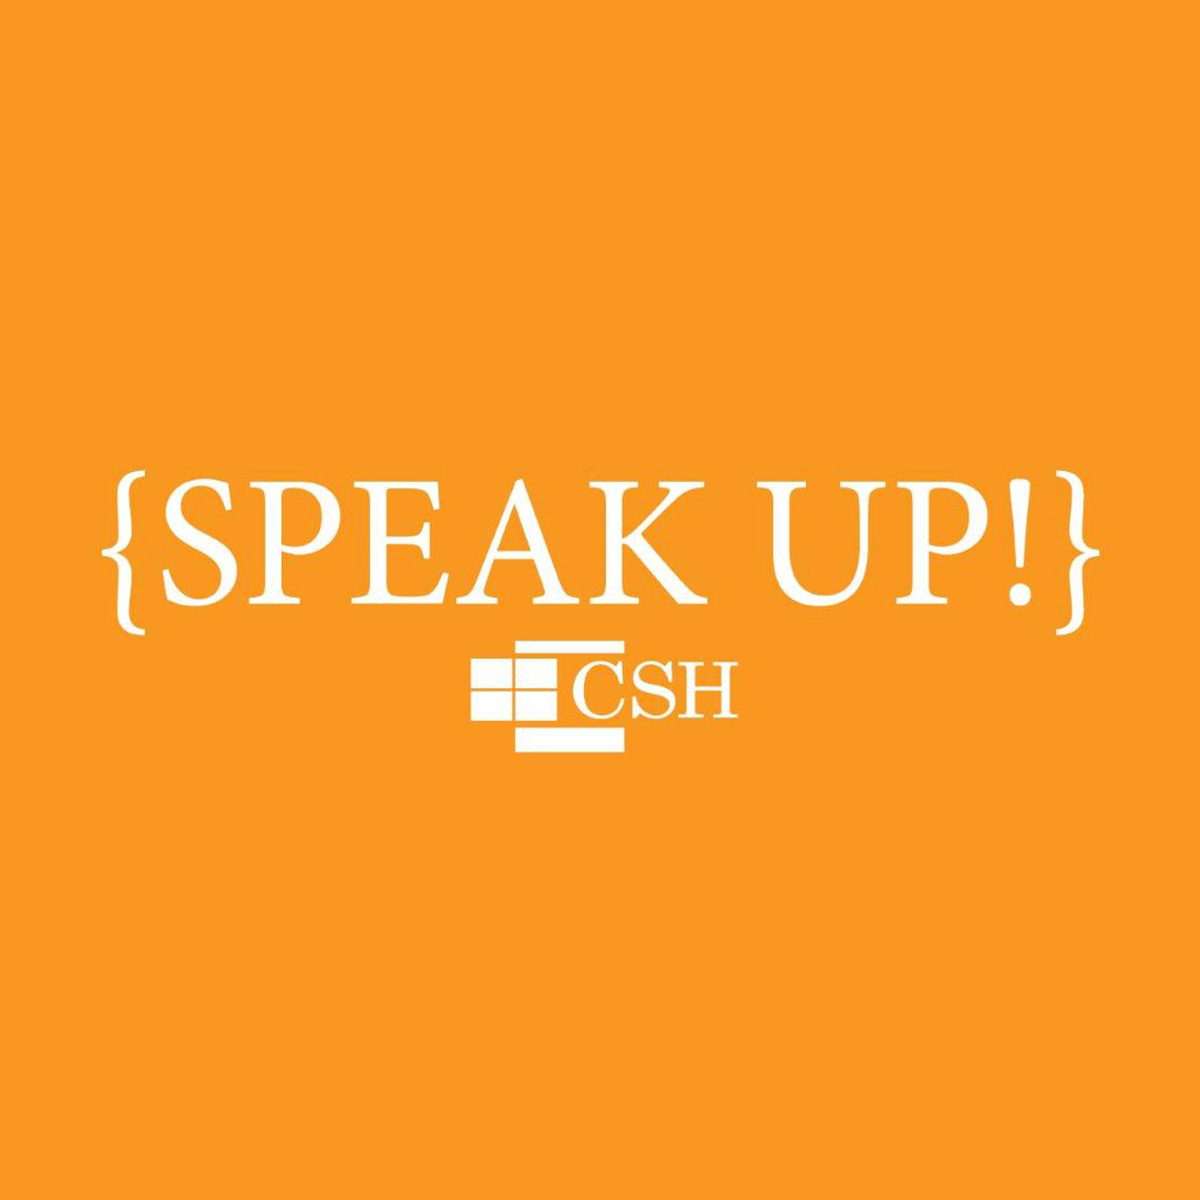 Speak Up 400x400.jpg